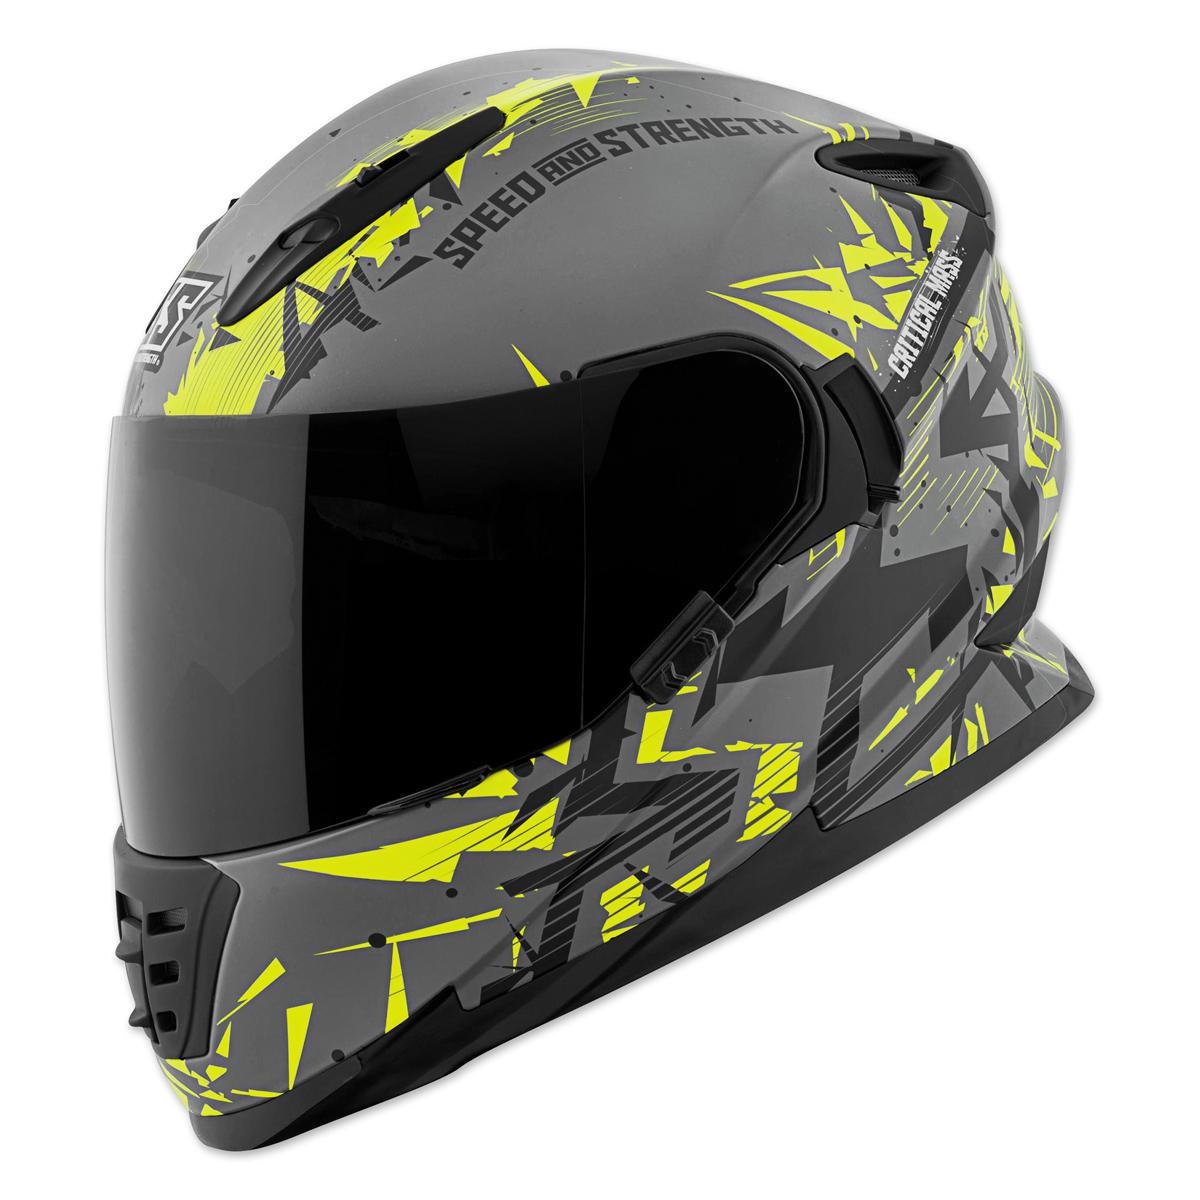 Speed and Strength SS1600 Critical Mass Gray/Hi-Viz/Black Full Face Helmet